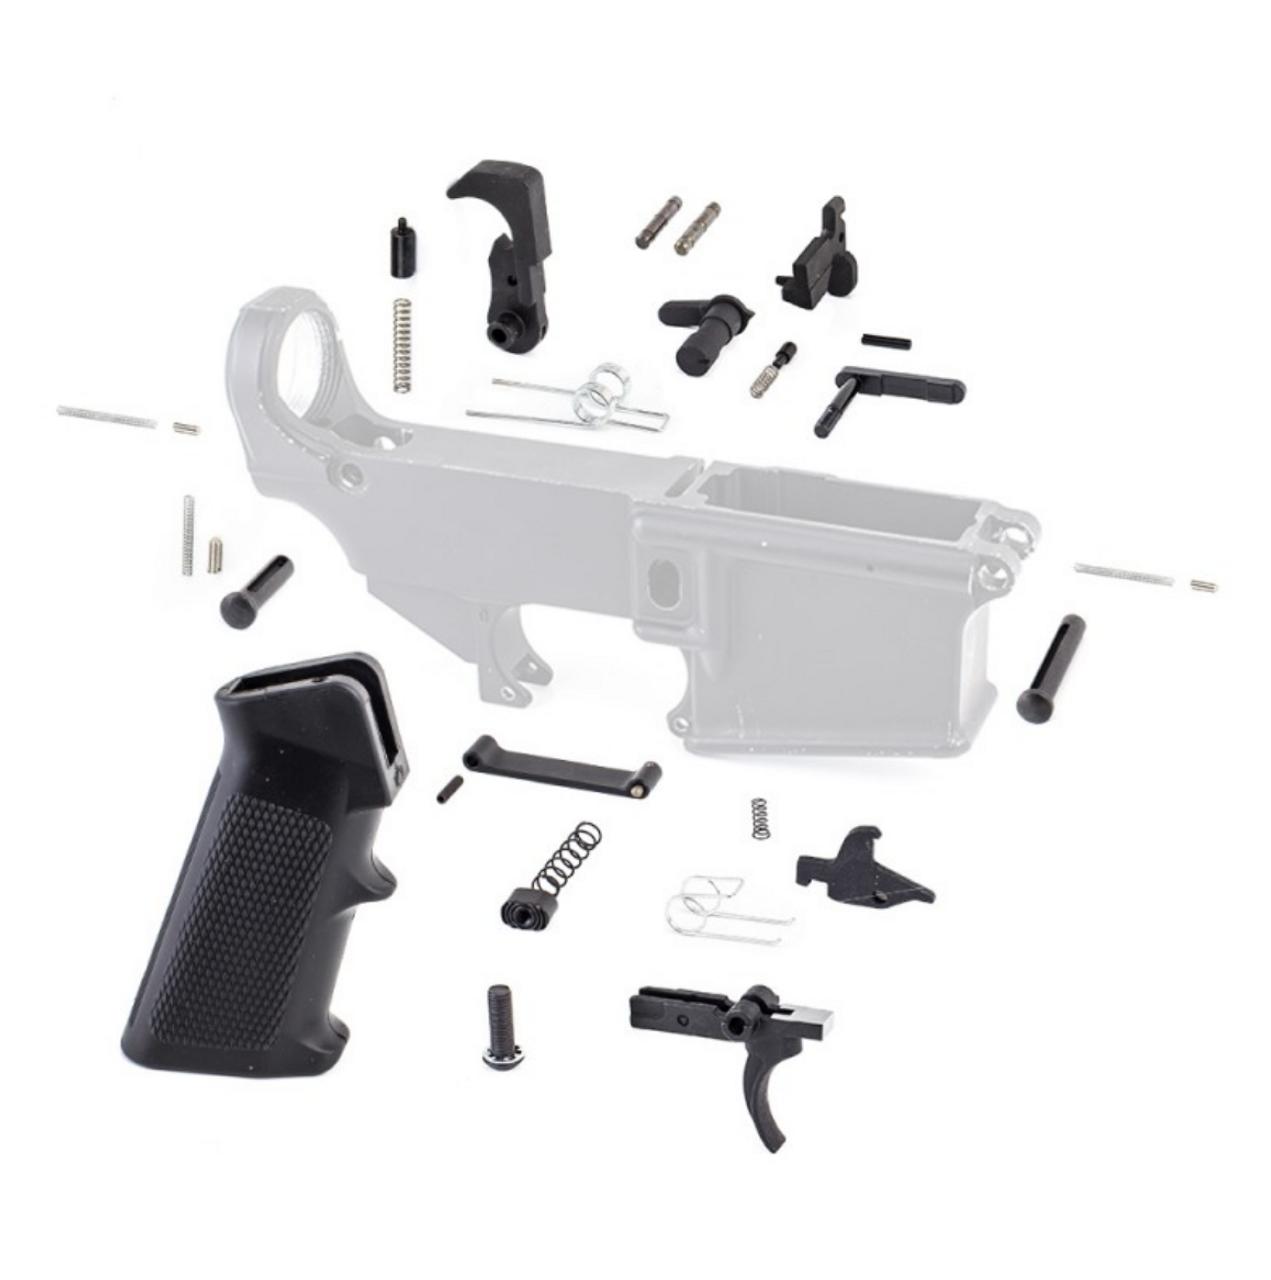 MCS Lower Parts Kit w/ Standard Grip & Trigger Guard LPK